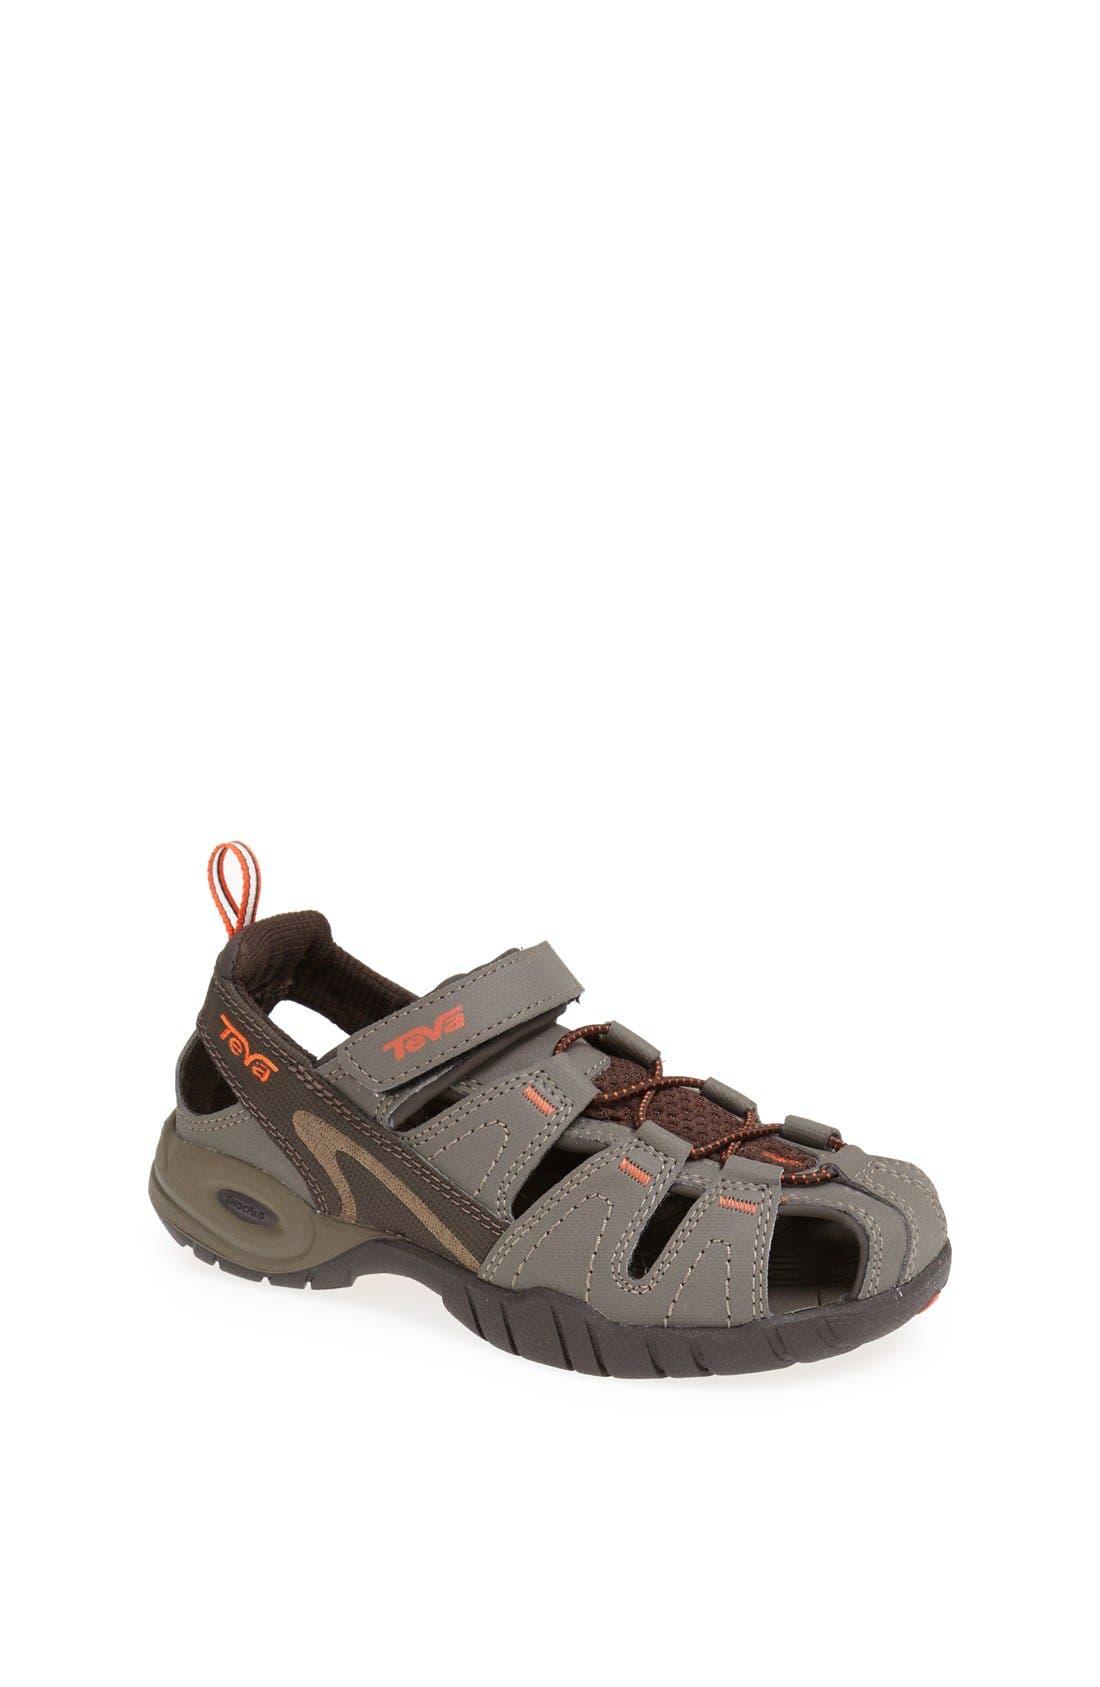 Alternate Image 1 Selected - Teva 'Dozer 3' Sandal (Toddler, Little Kid & Big Kid)